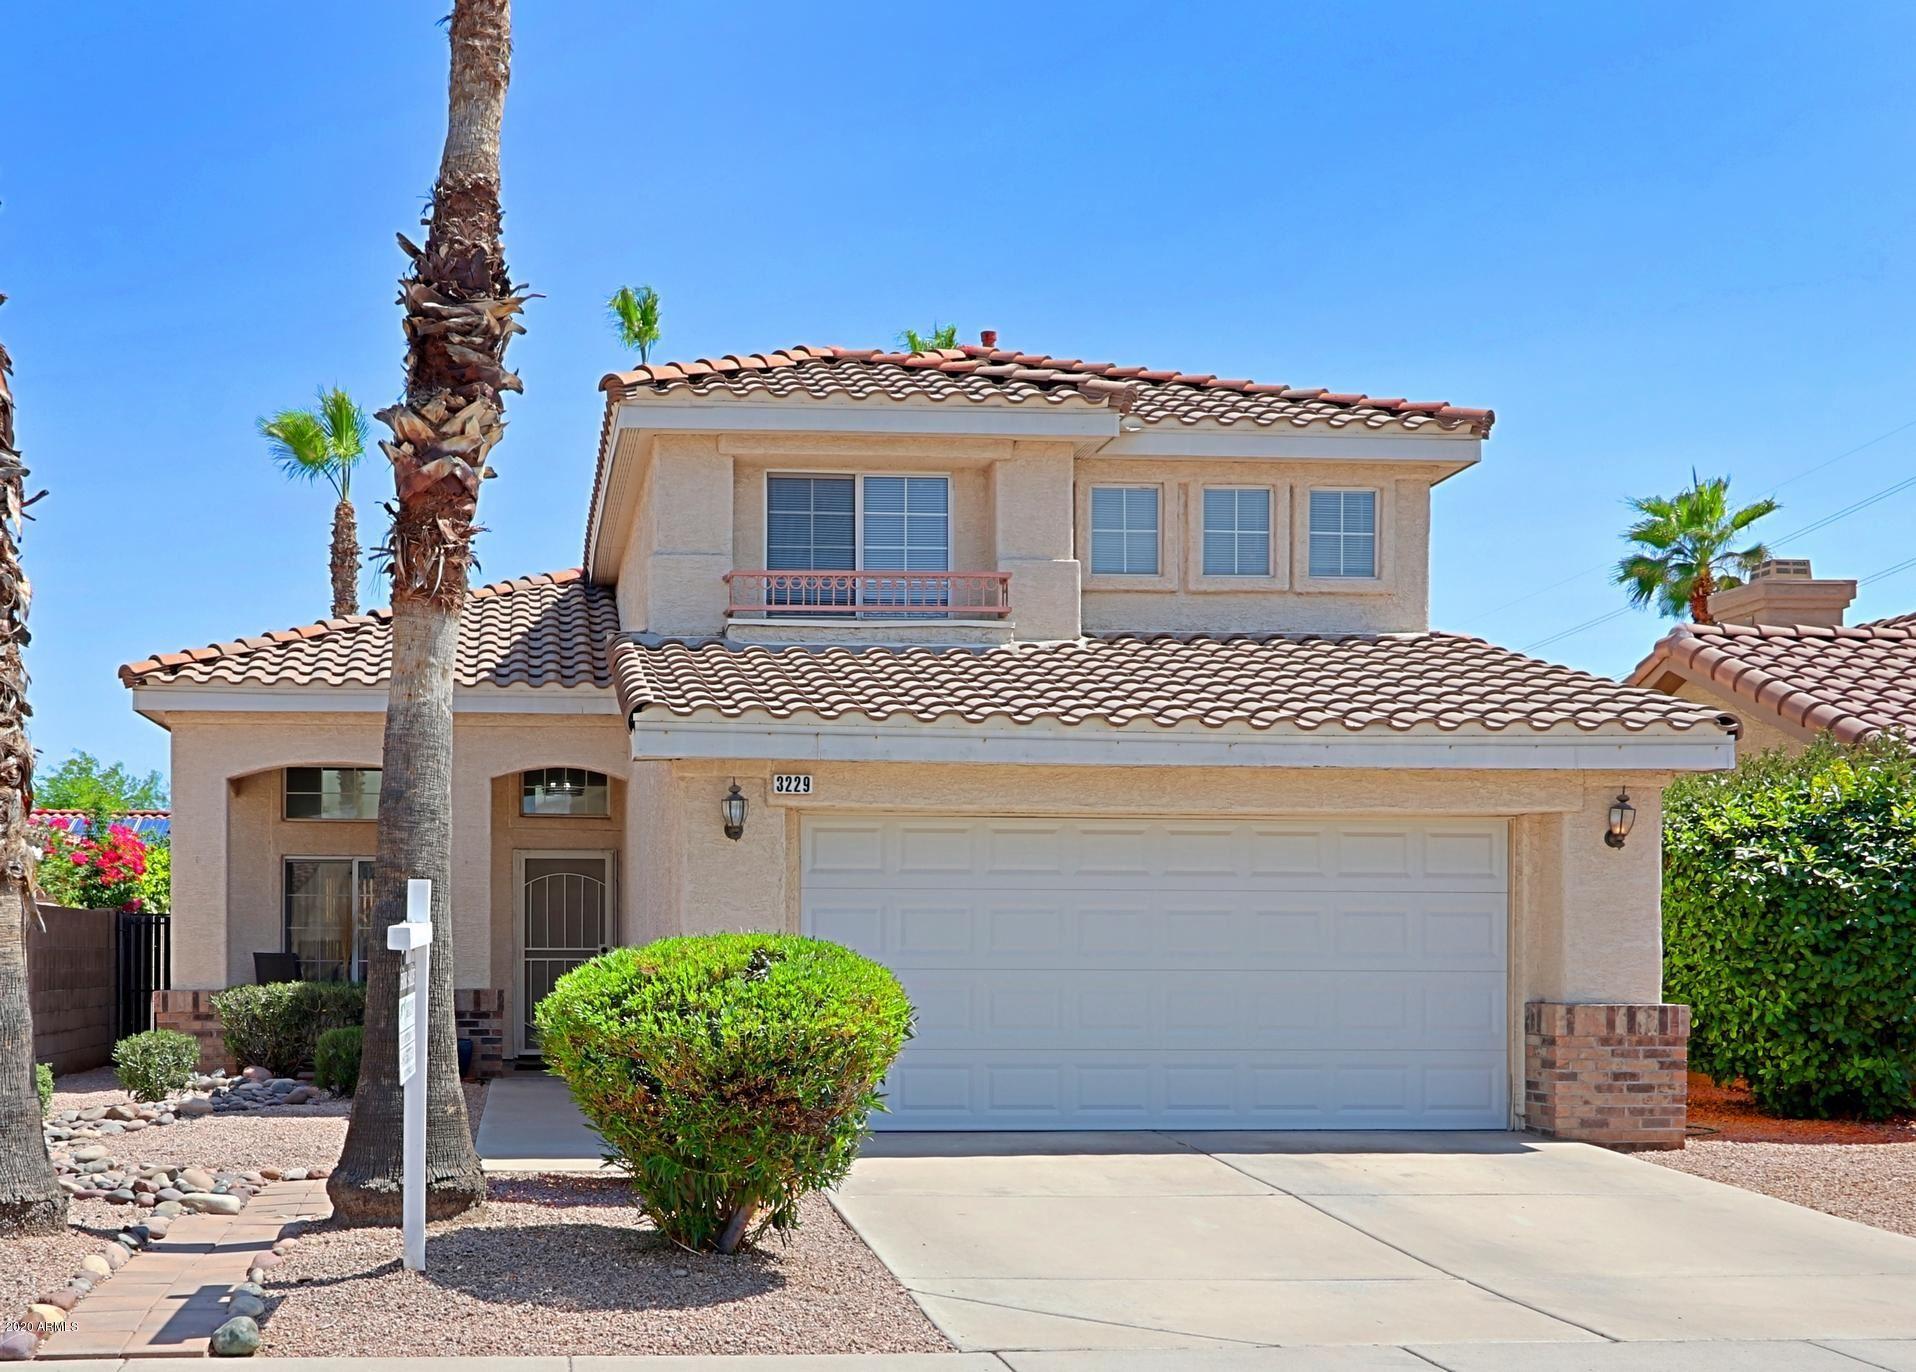 3229 E WAHALLA Lane, Phoenix, AZ 85050 - MLS#: 6094554